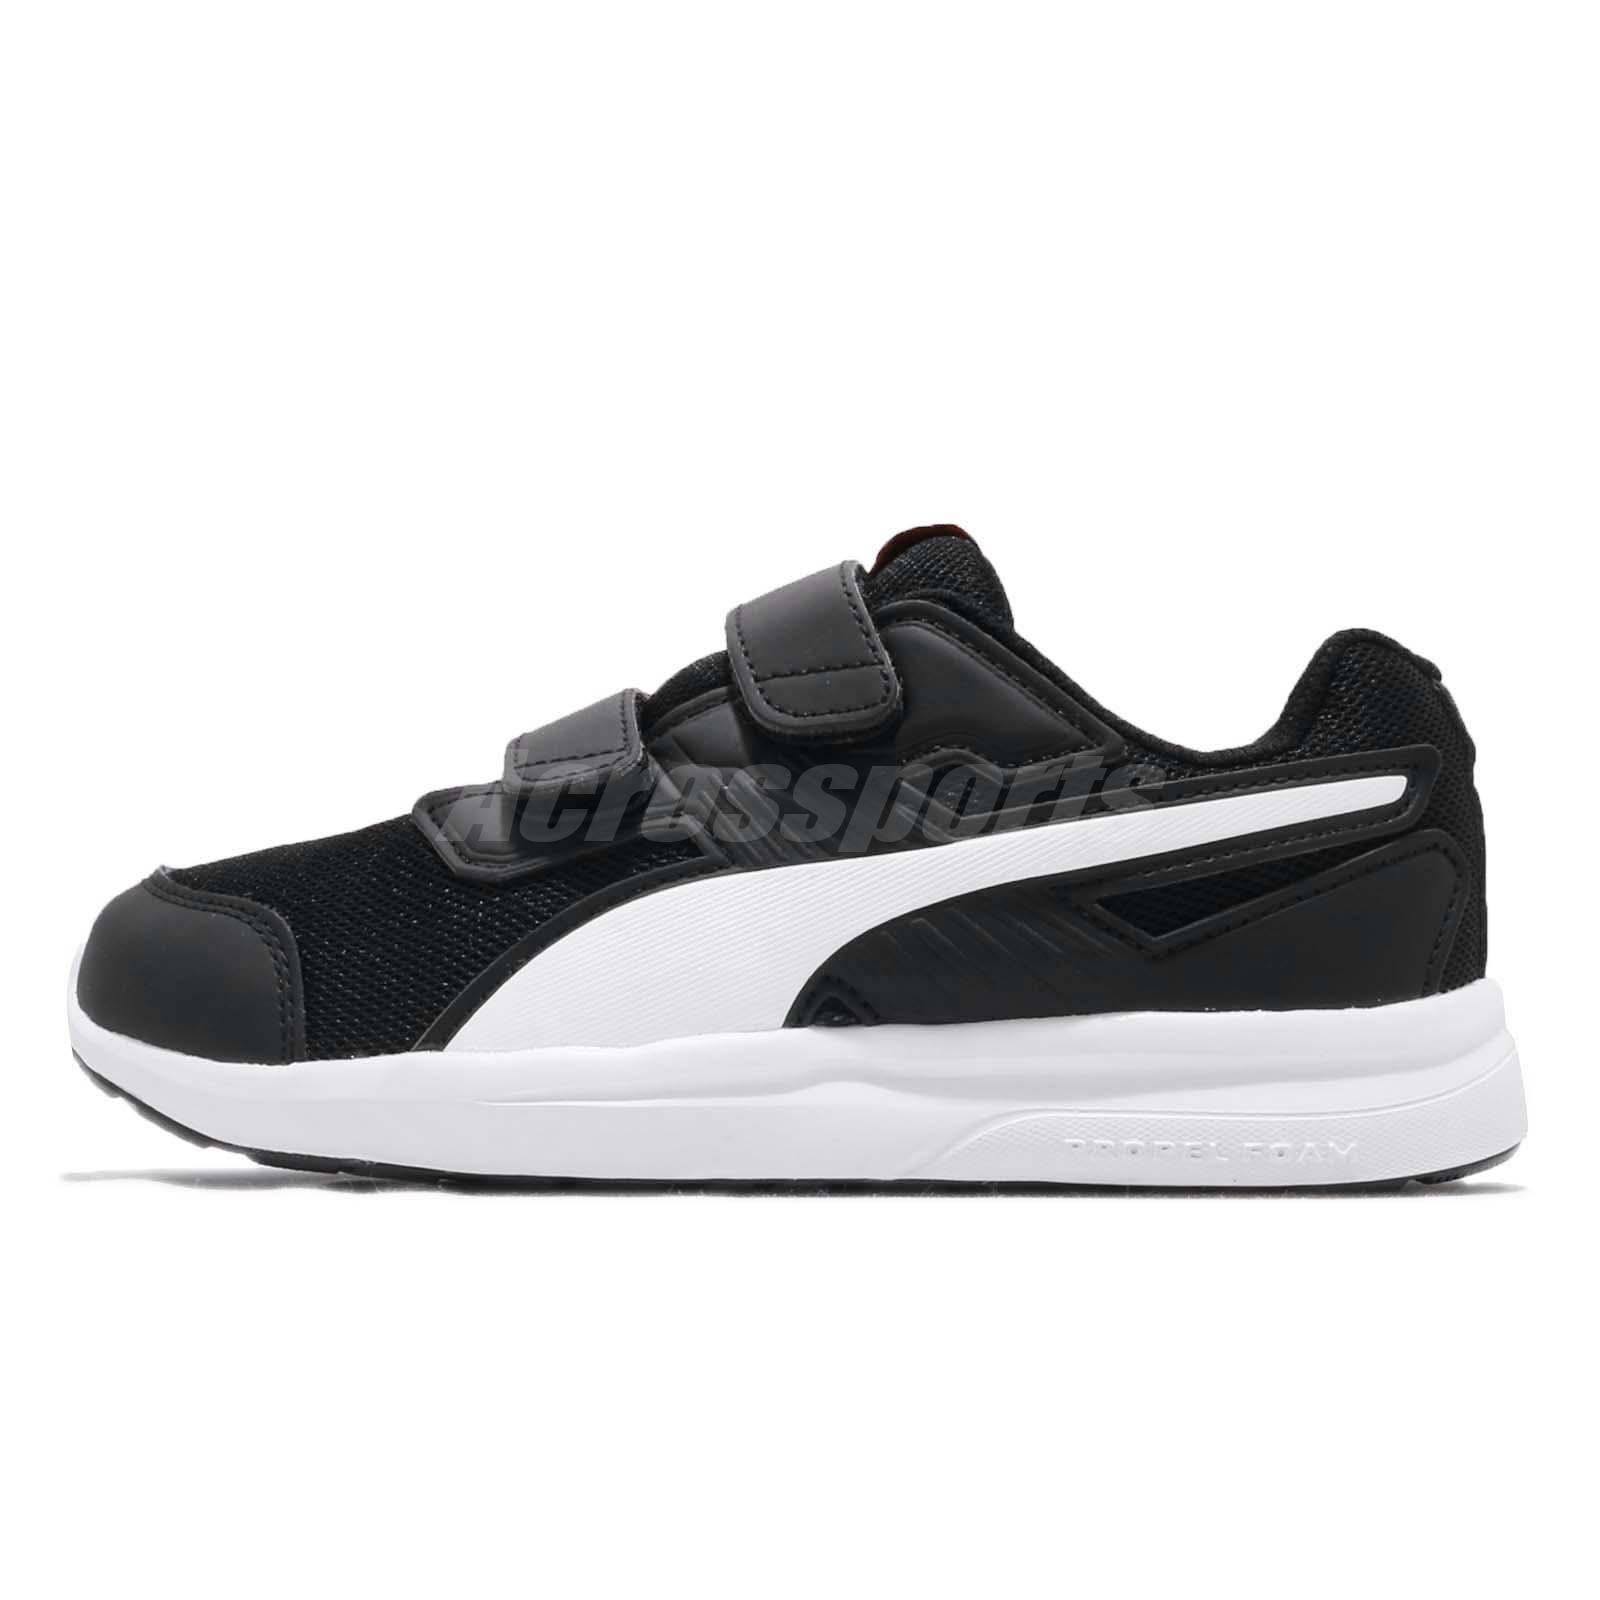 Puma Escaper Mesh V PS Black White Strap Kid Preschool Shoes Sneakers 190326 -08 d1466ea89eb